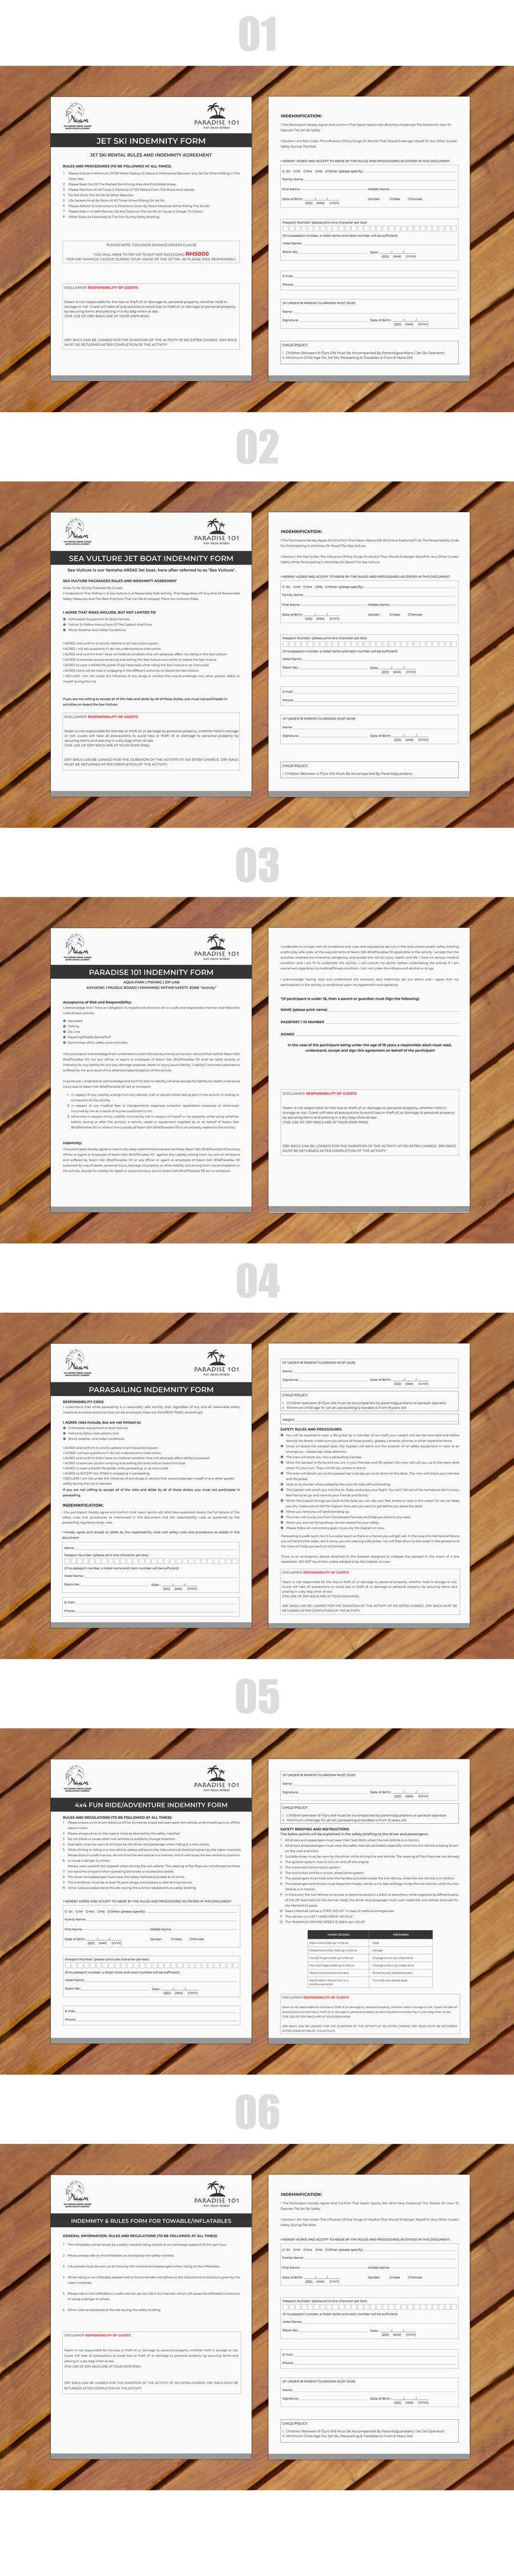 Natečajni vnos #10 za Create Nice Designed Forms